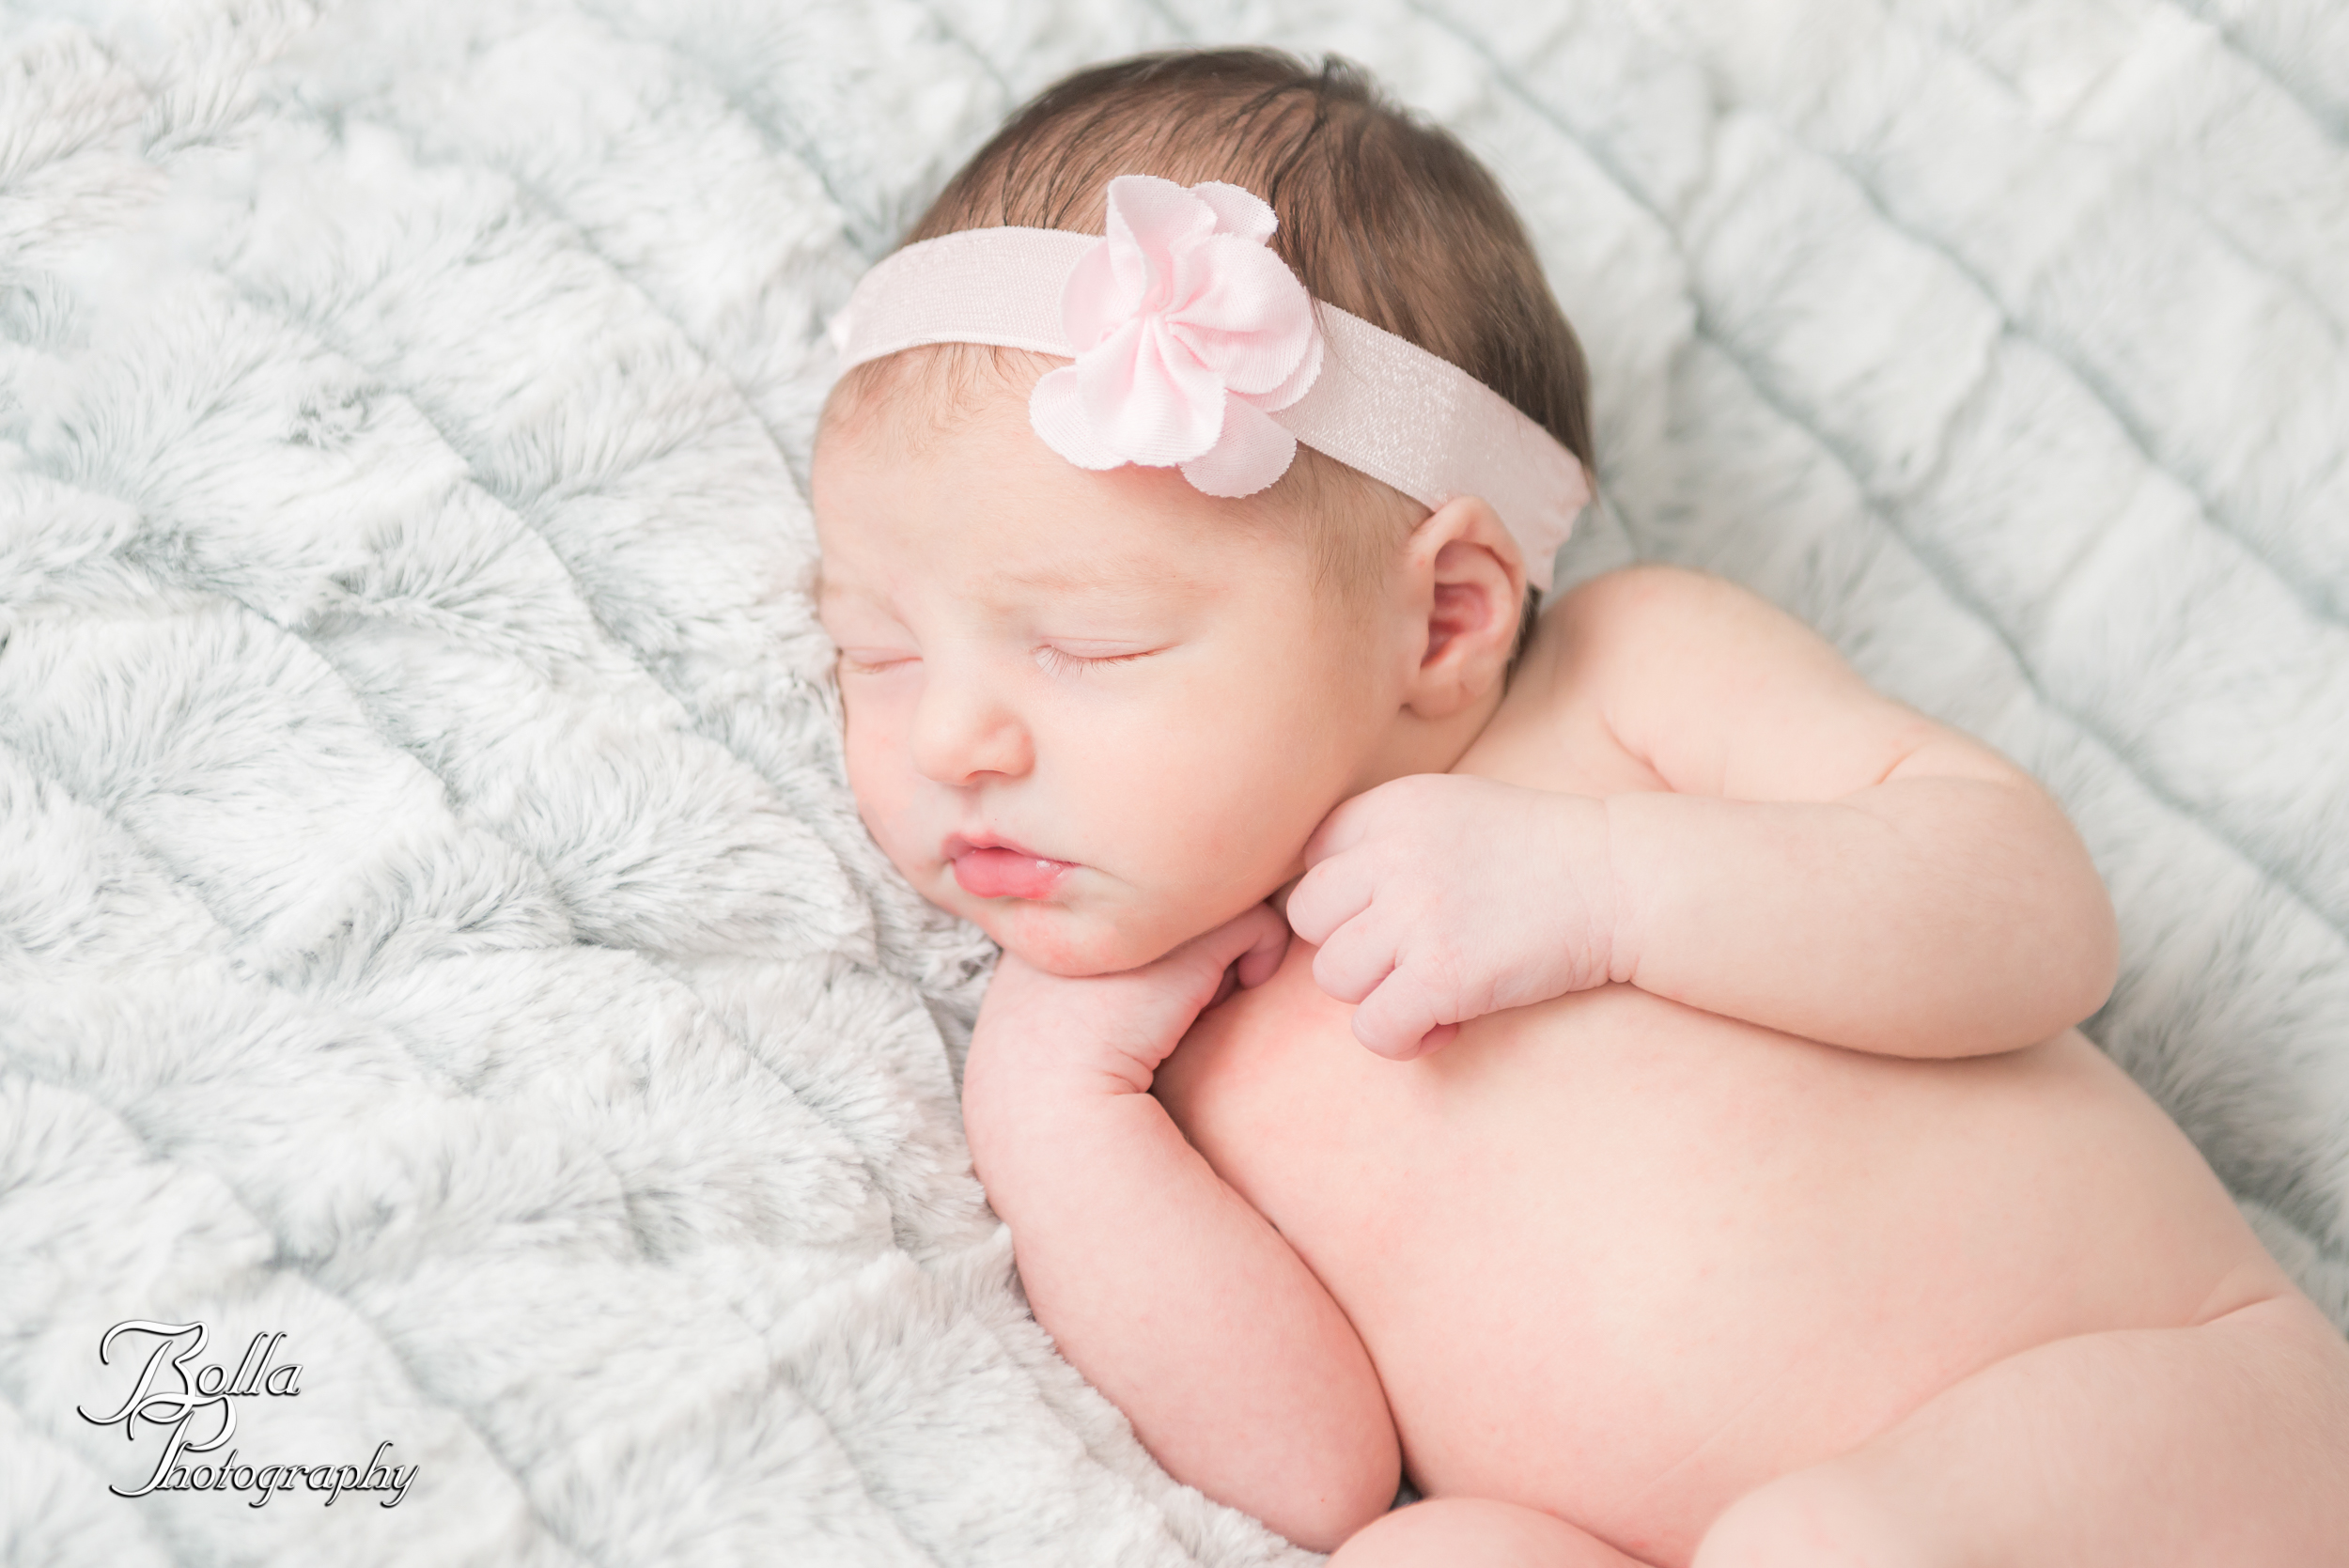 20170826_Bolla photography edwardsville wedding newborn photographer st louis weddings babies-0001.jpg